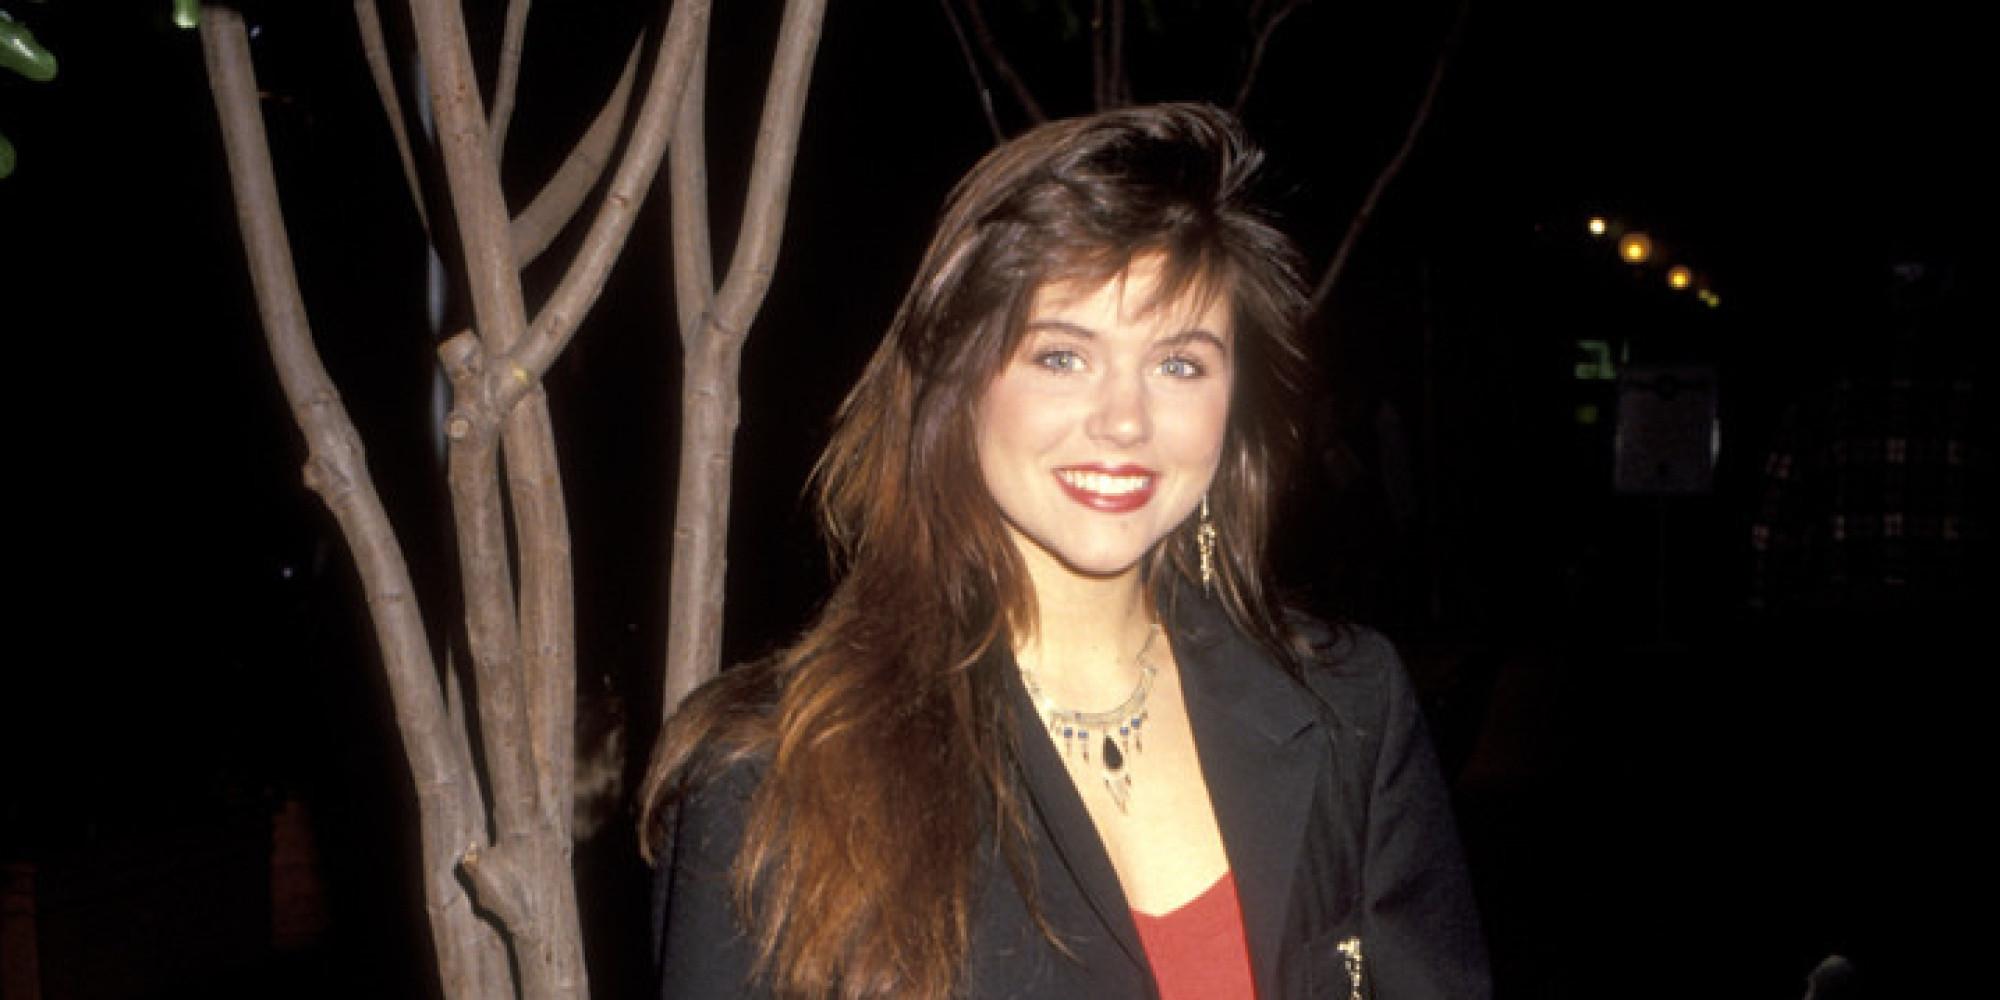 Harperamber: All The Times Tiffani Thiessen Was So '90s